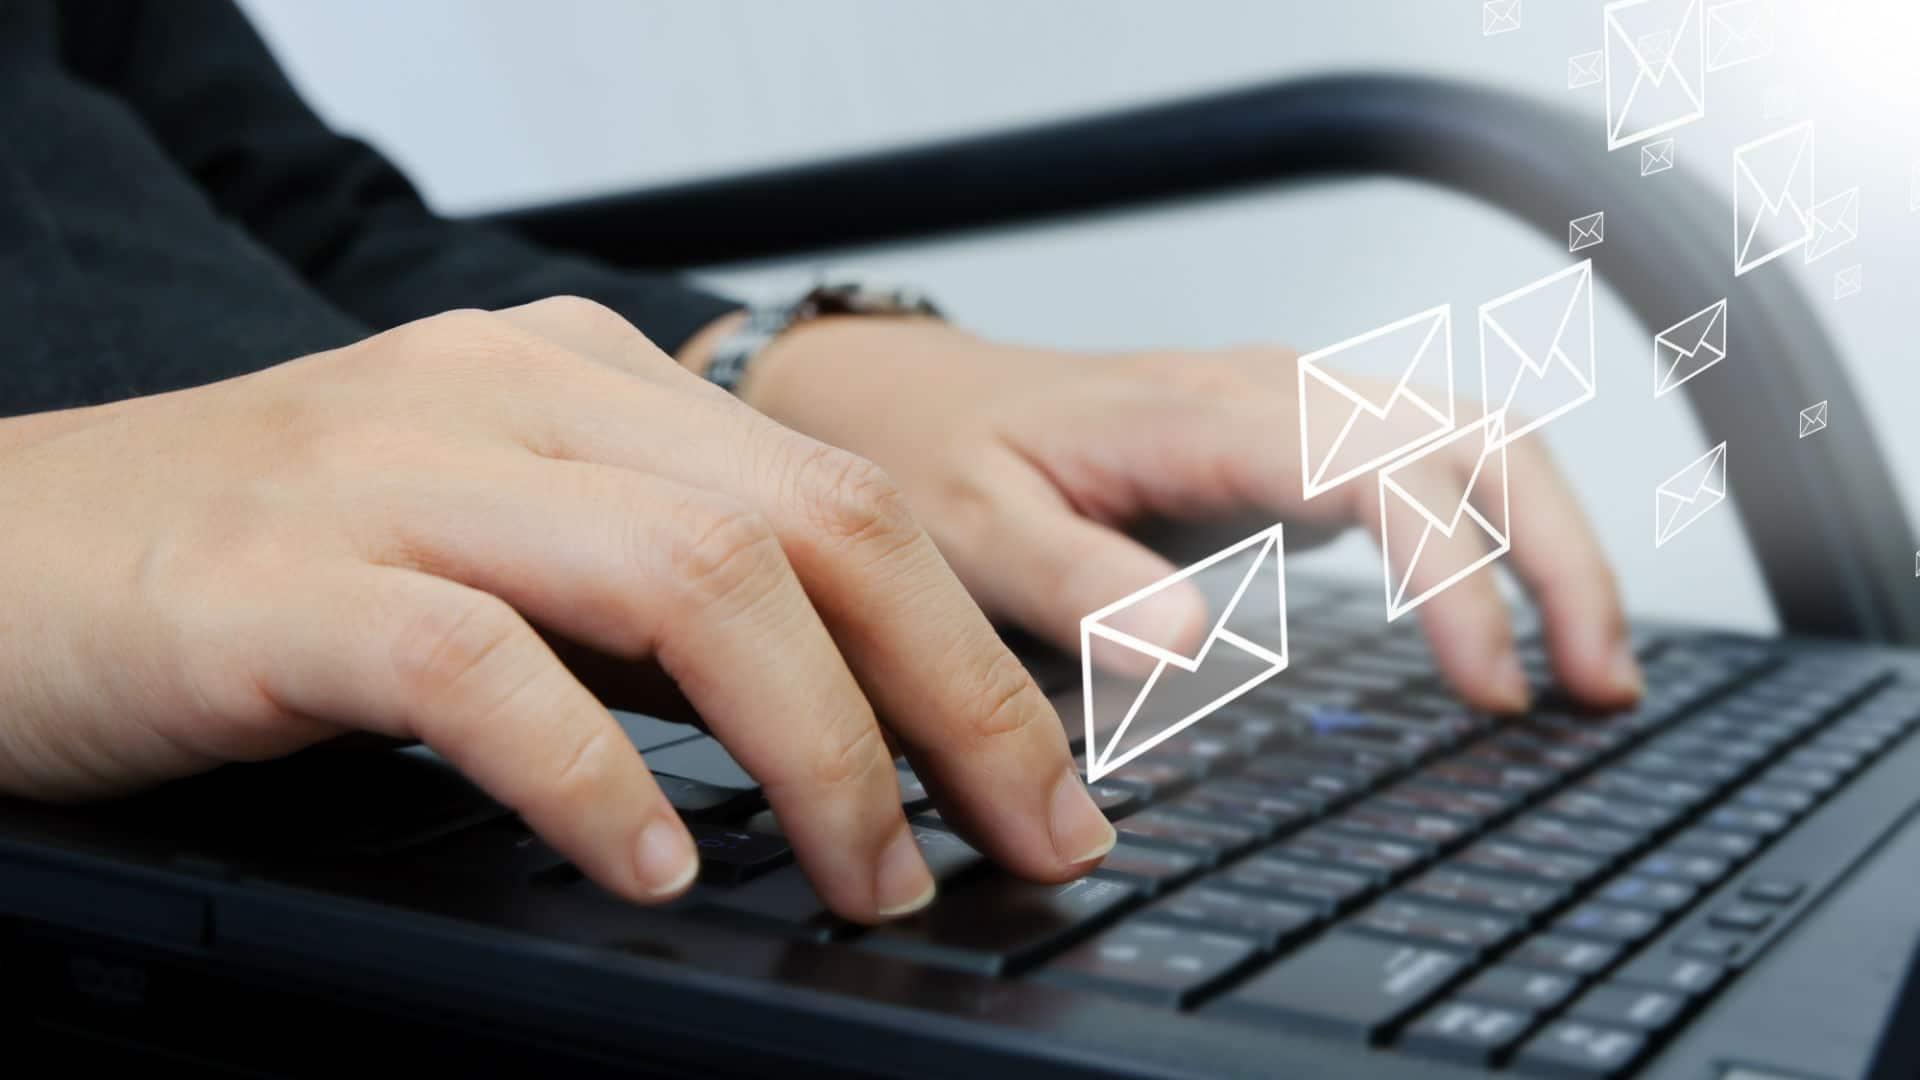 emailserver.jpg